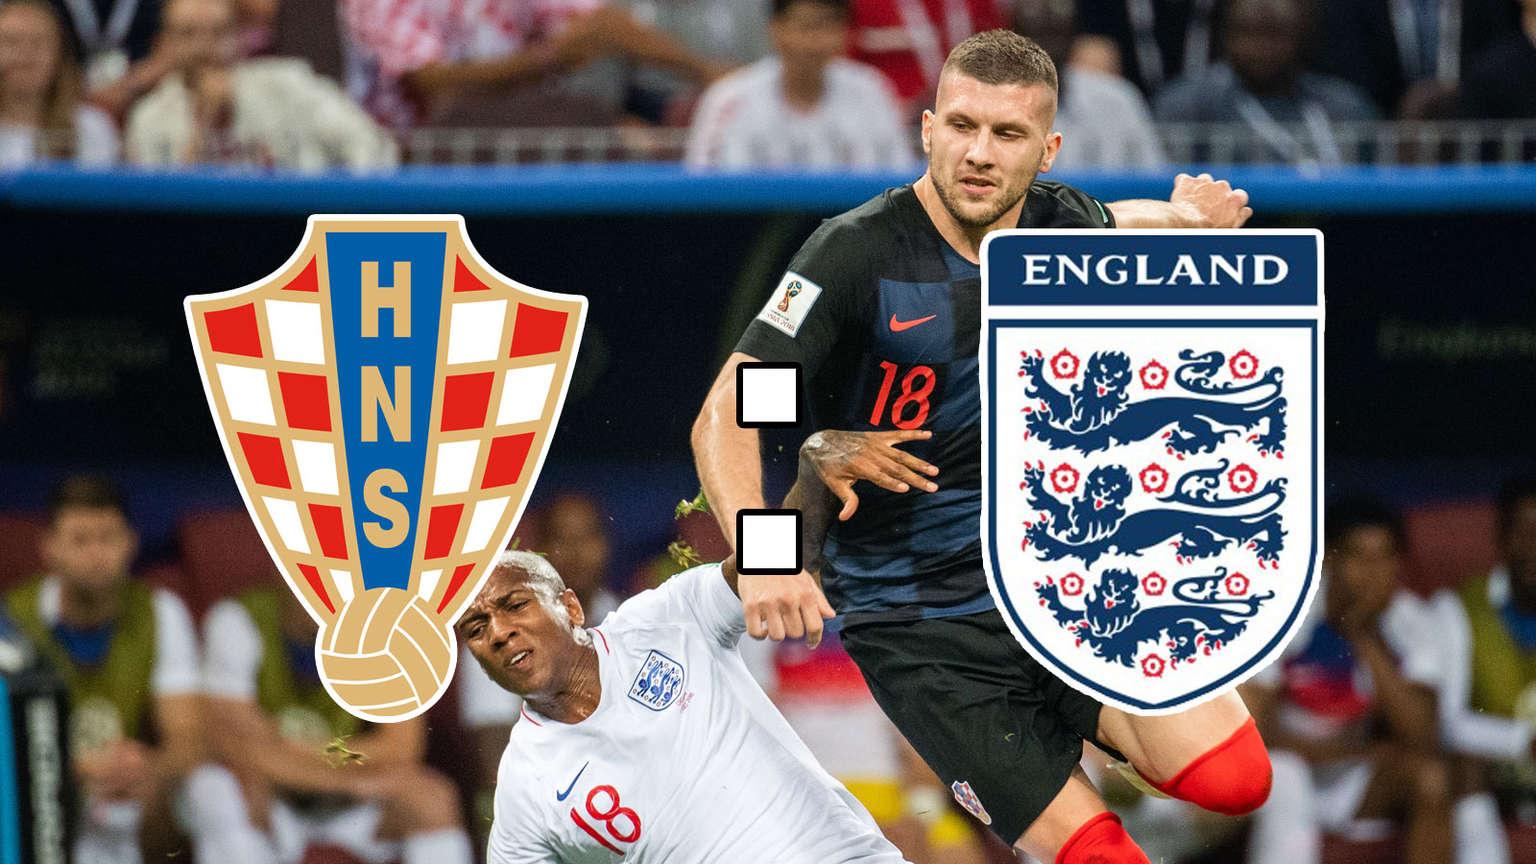 Schiedsrichter England Kroatien